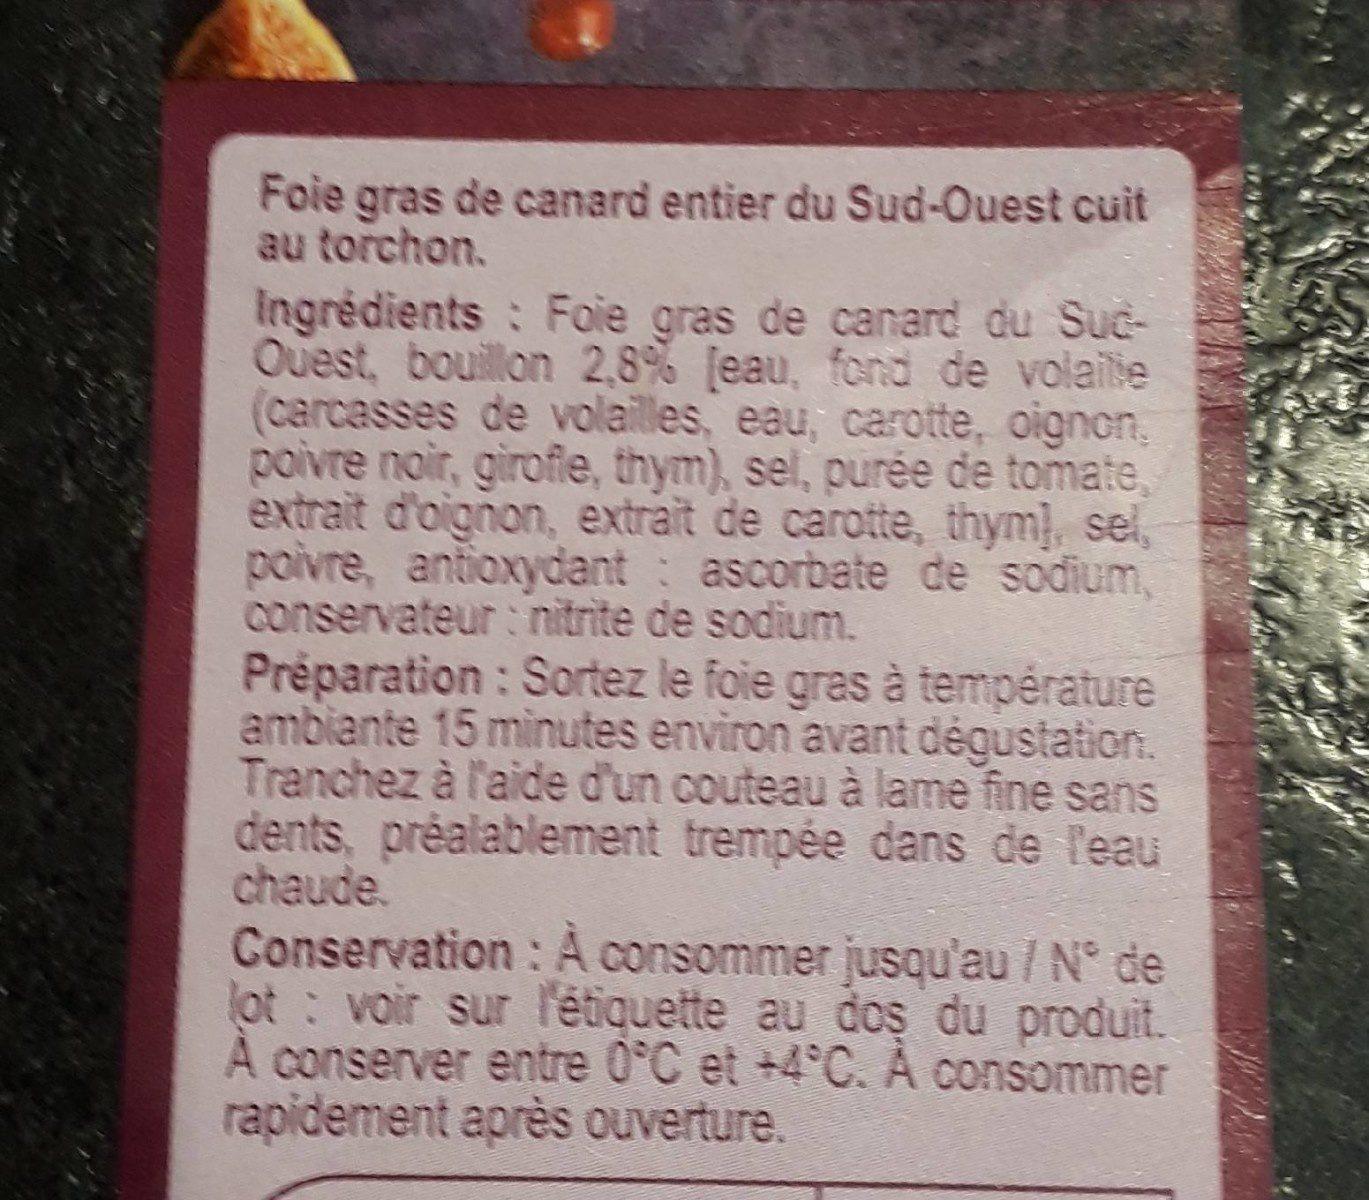 Foie gras de canard entier du sud-ouest - Ingrediënten - fr